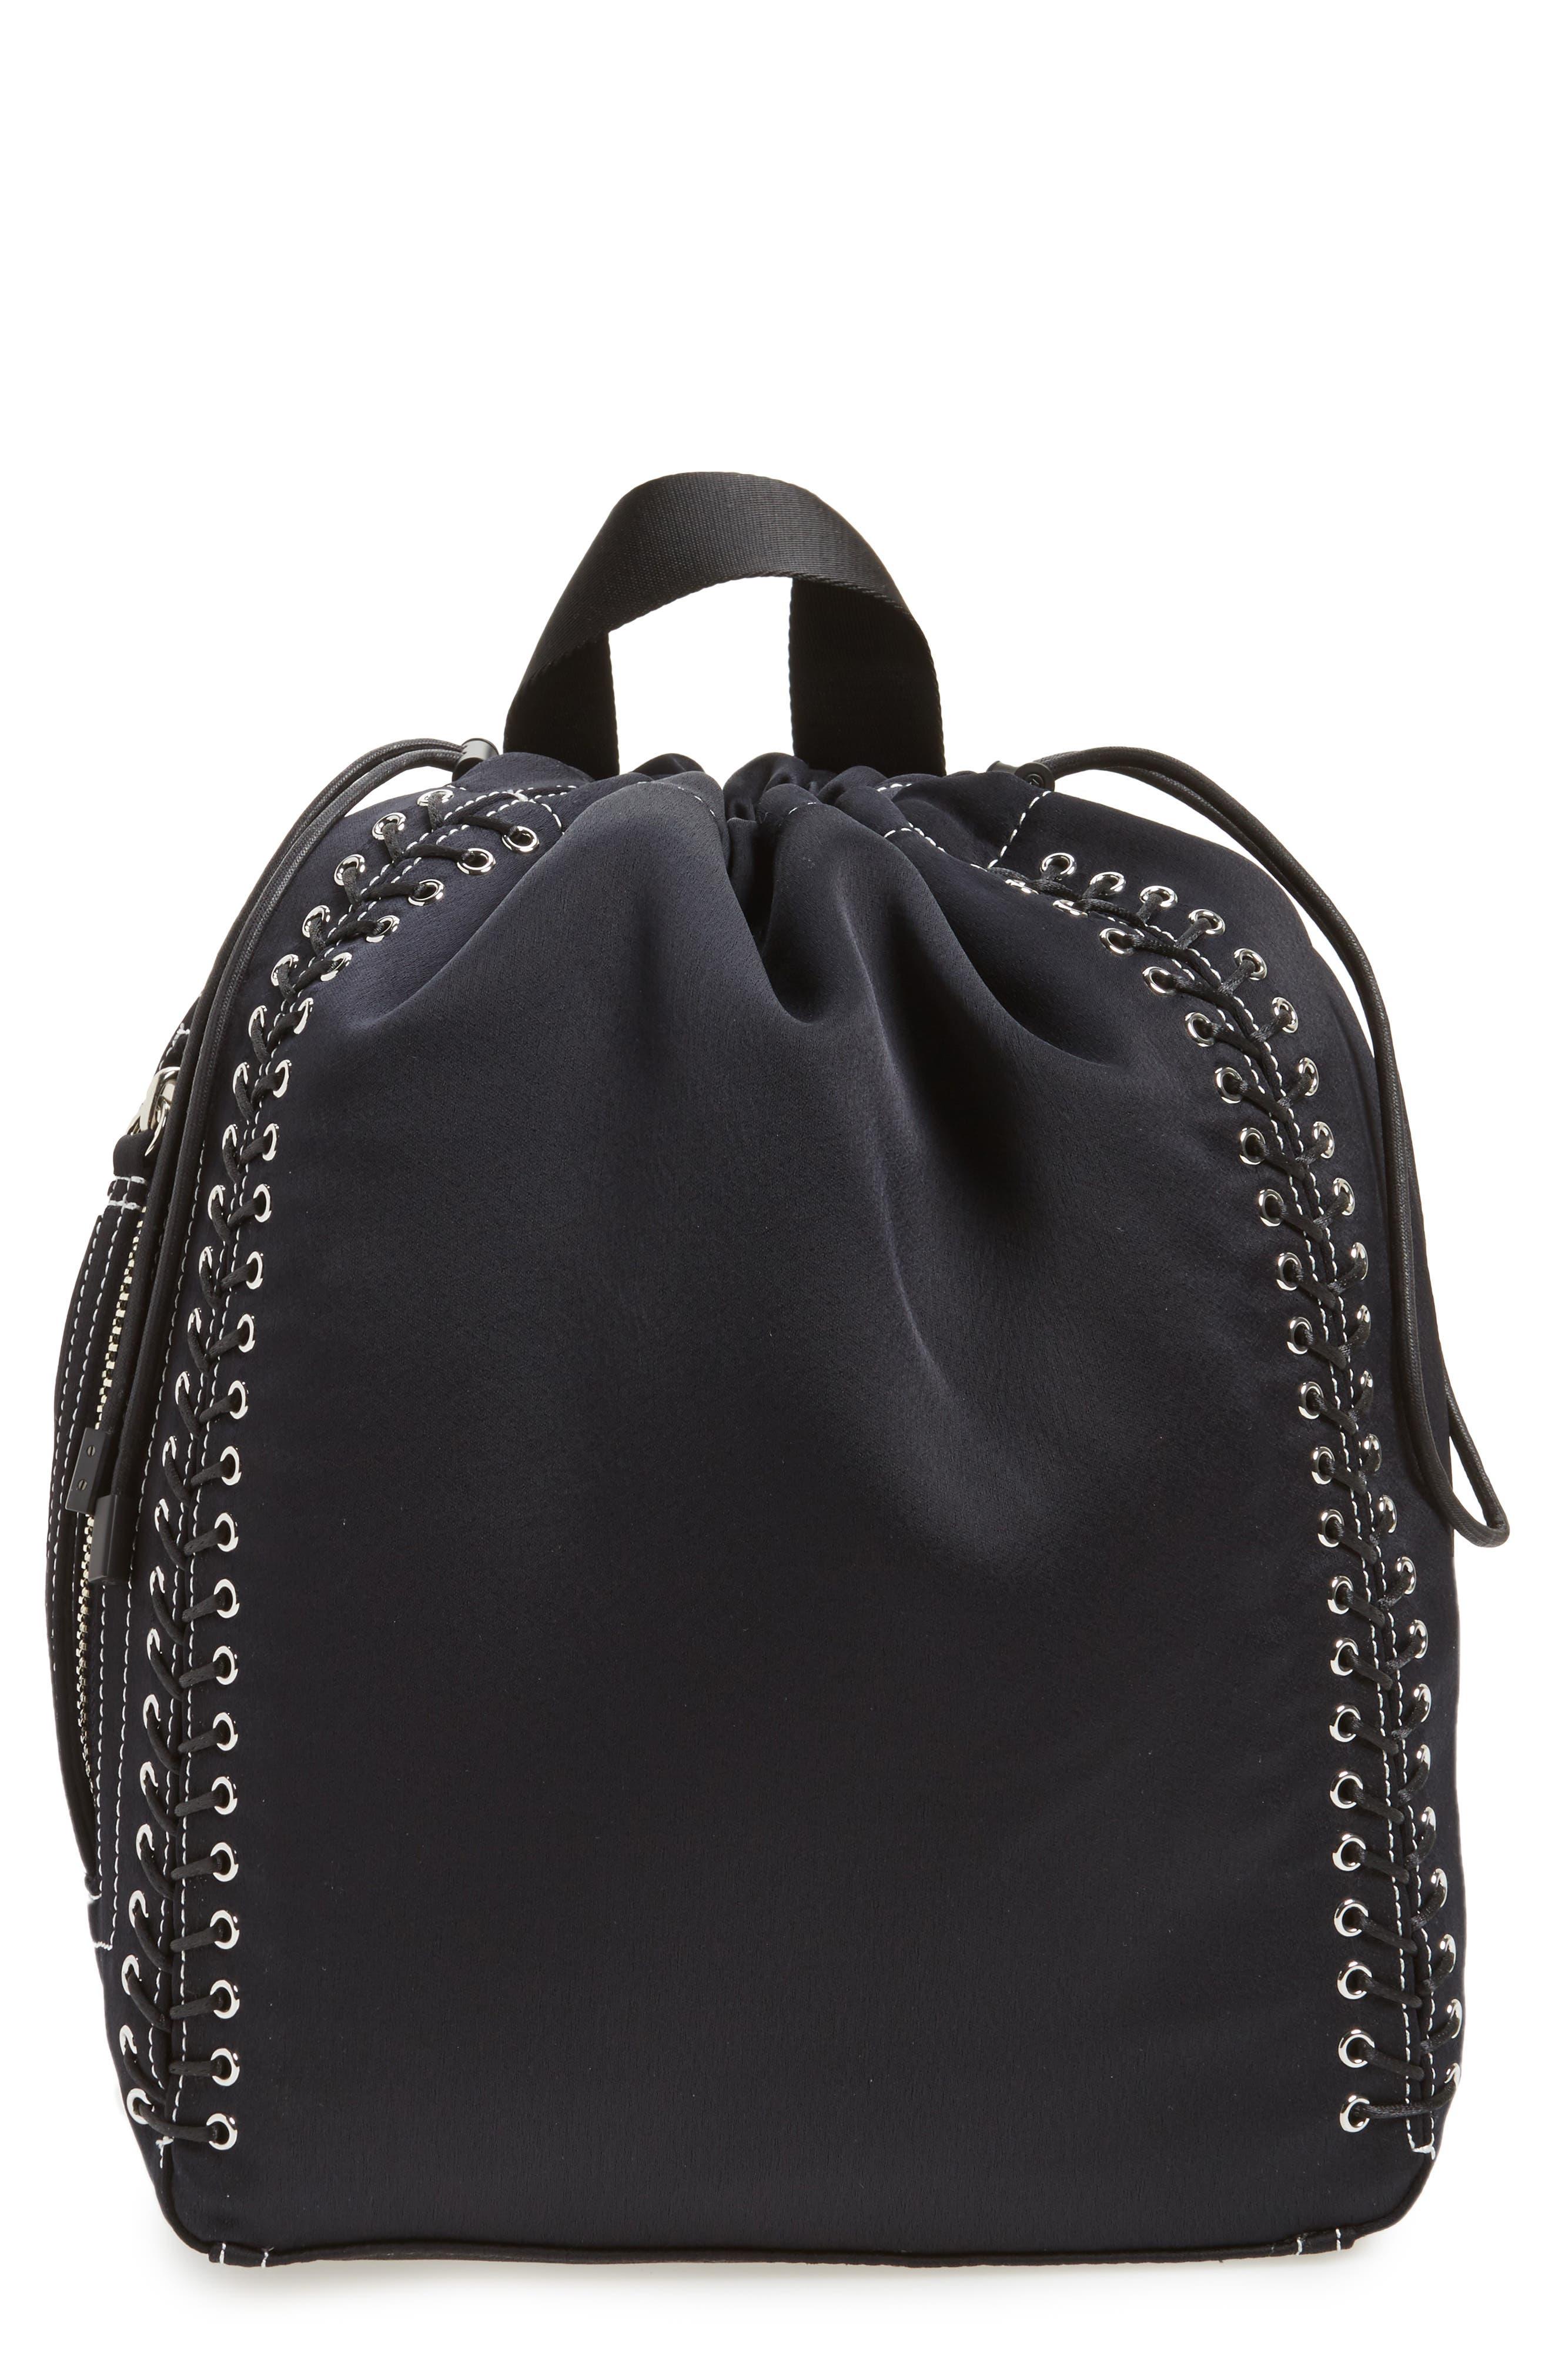 Alternate Image 1 Selected - Phillip Lim 3.1 Medium Go-Go Lace-Up Backpack